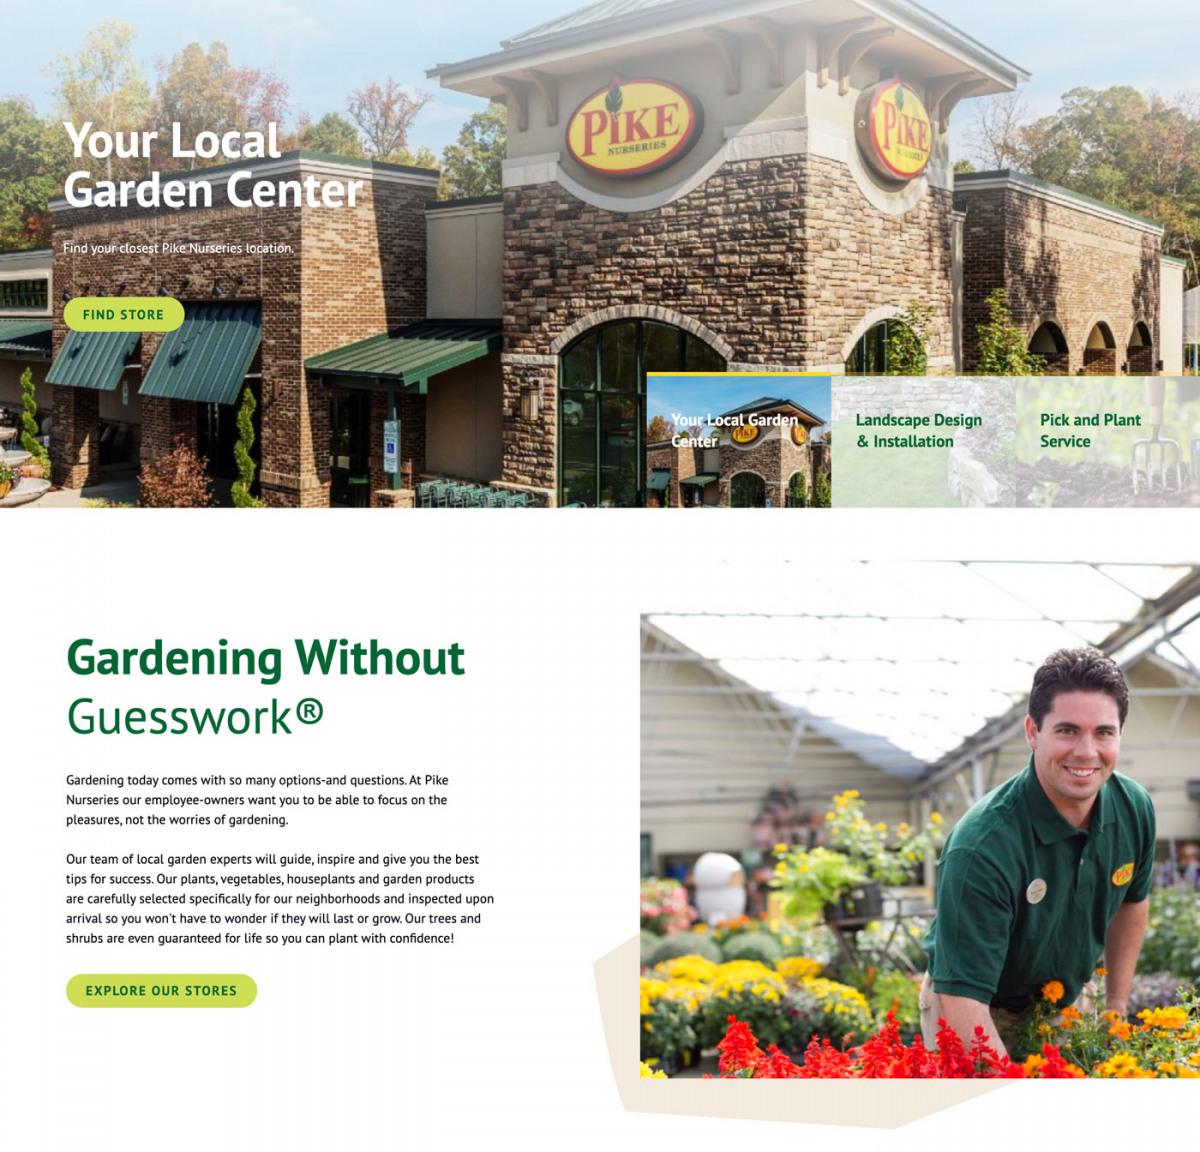 Image of website for Pike Nursery